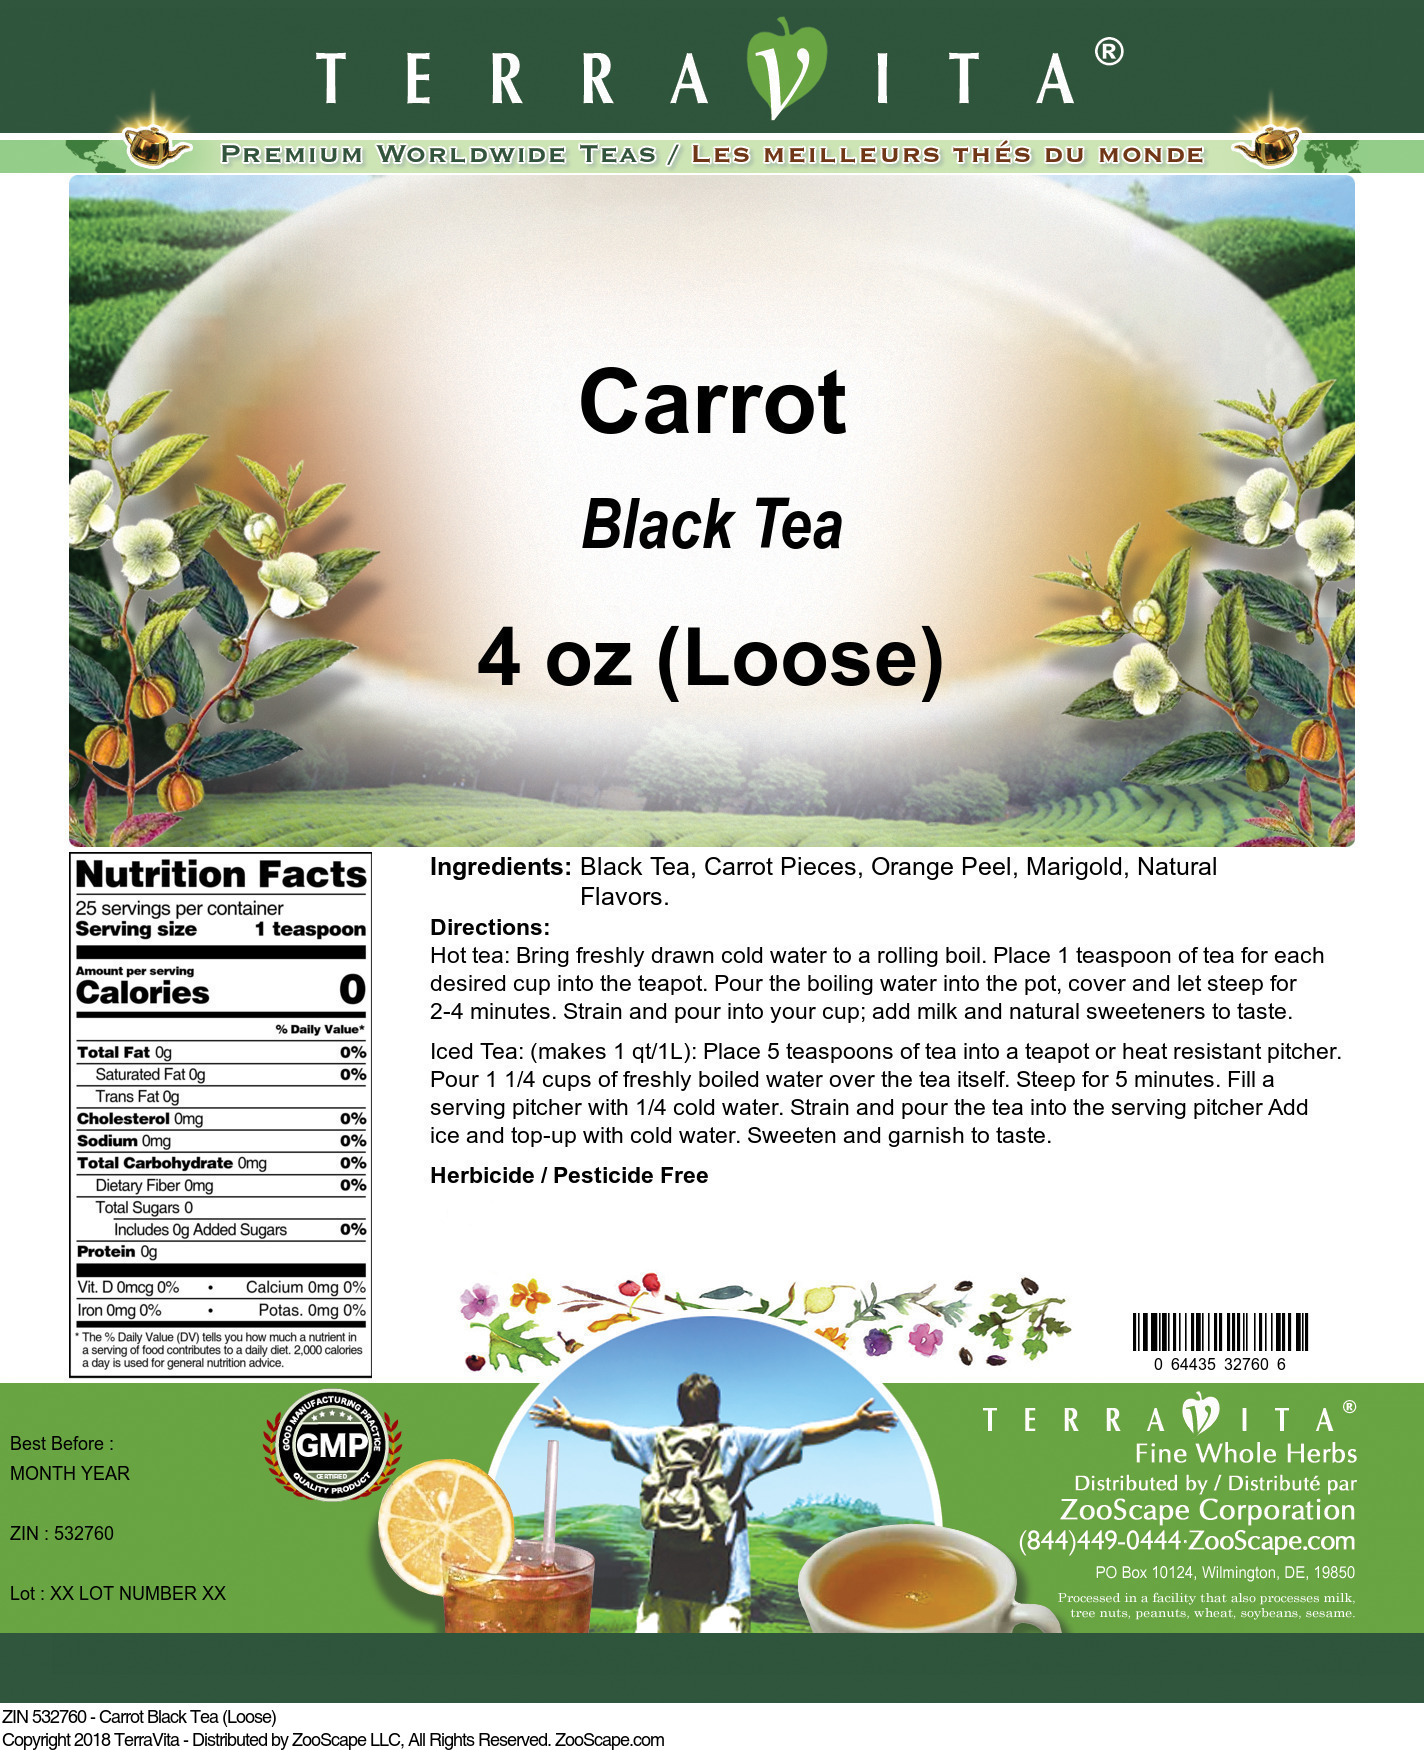 Carrot Black Tea